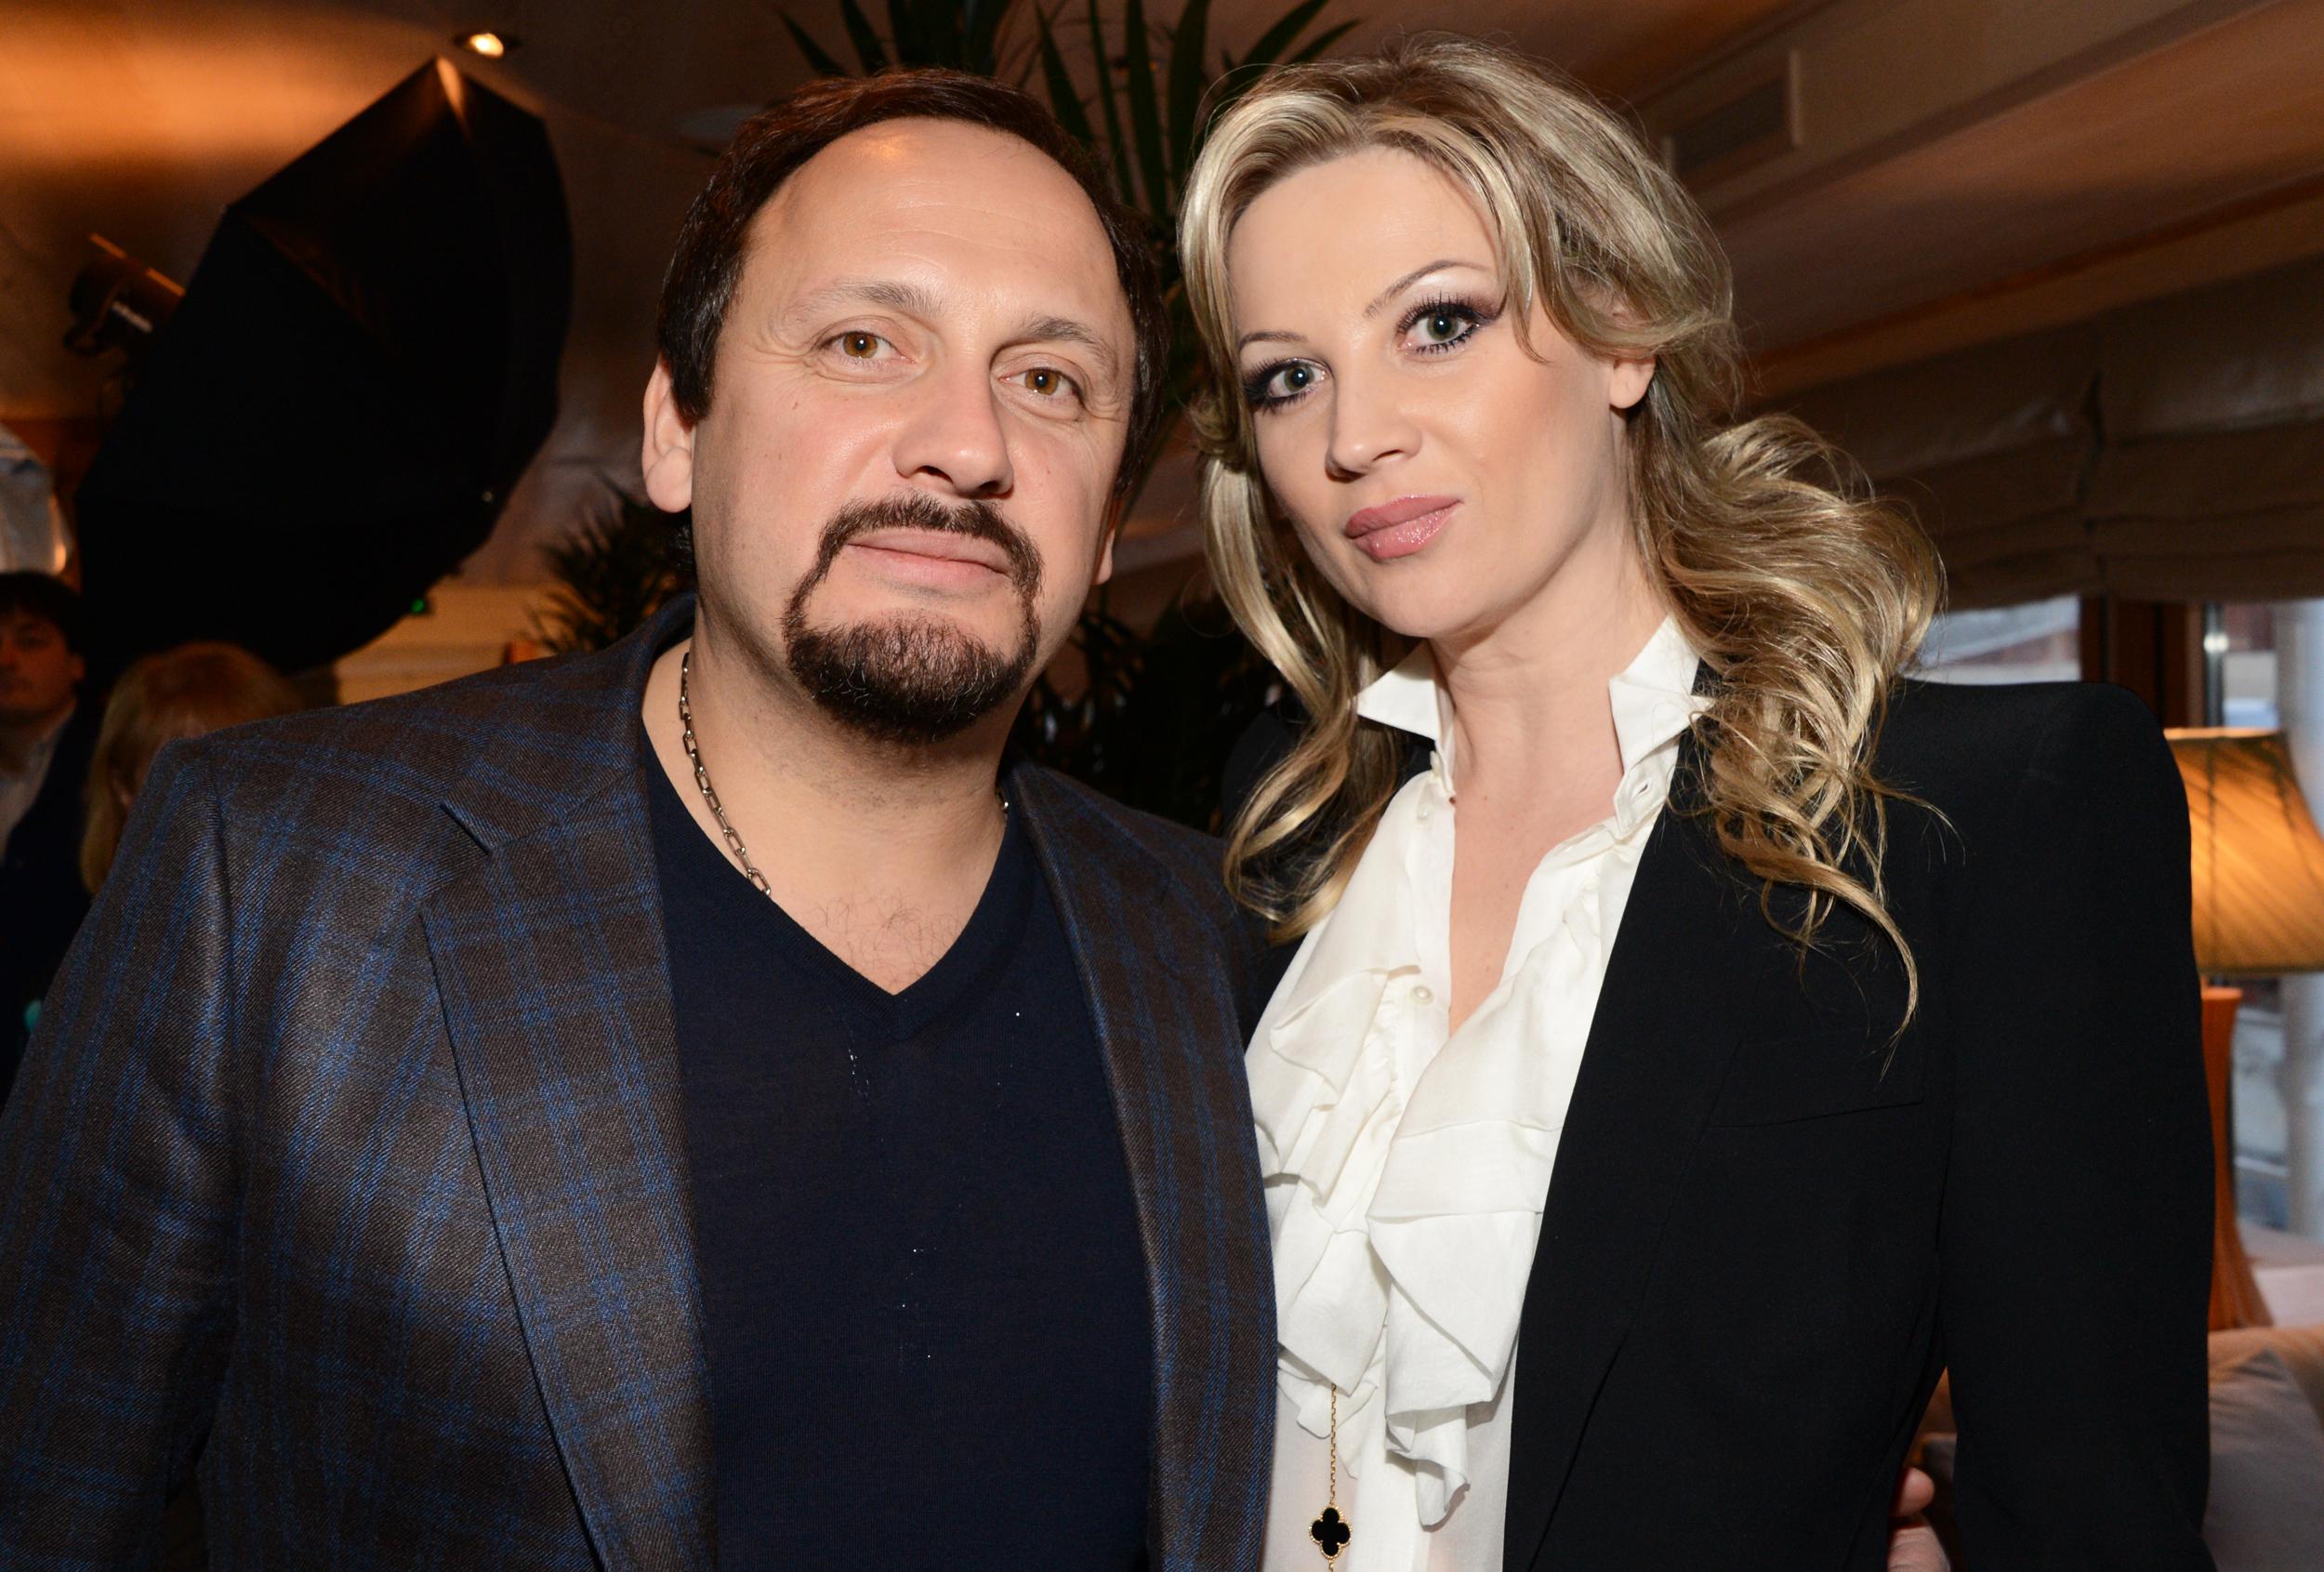 malie-trahayutsya-zhena-stasa-mihaylova-porno-porno-uniforma-chulki